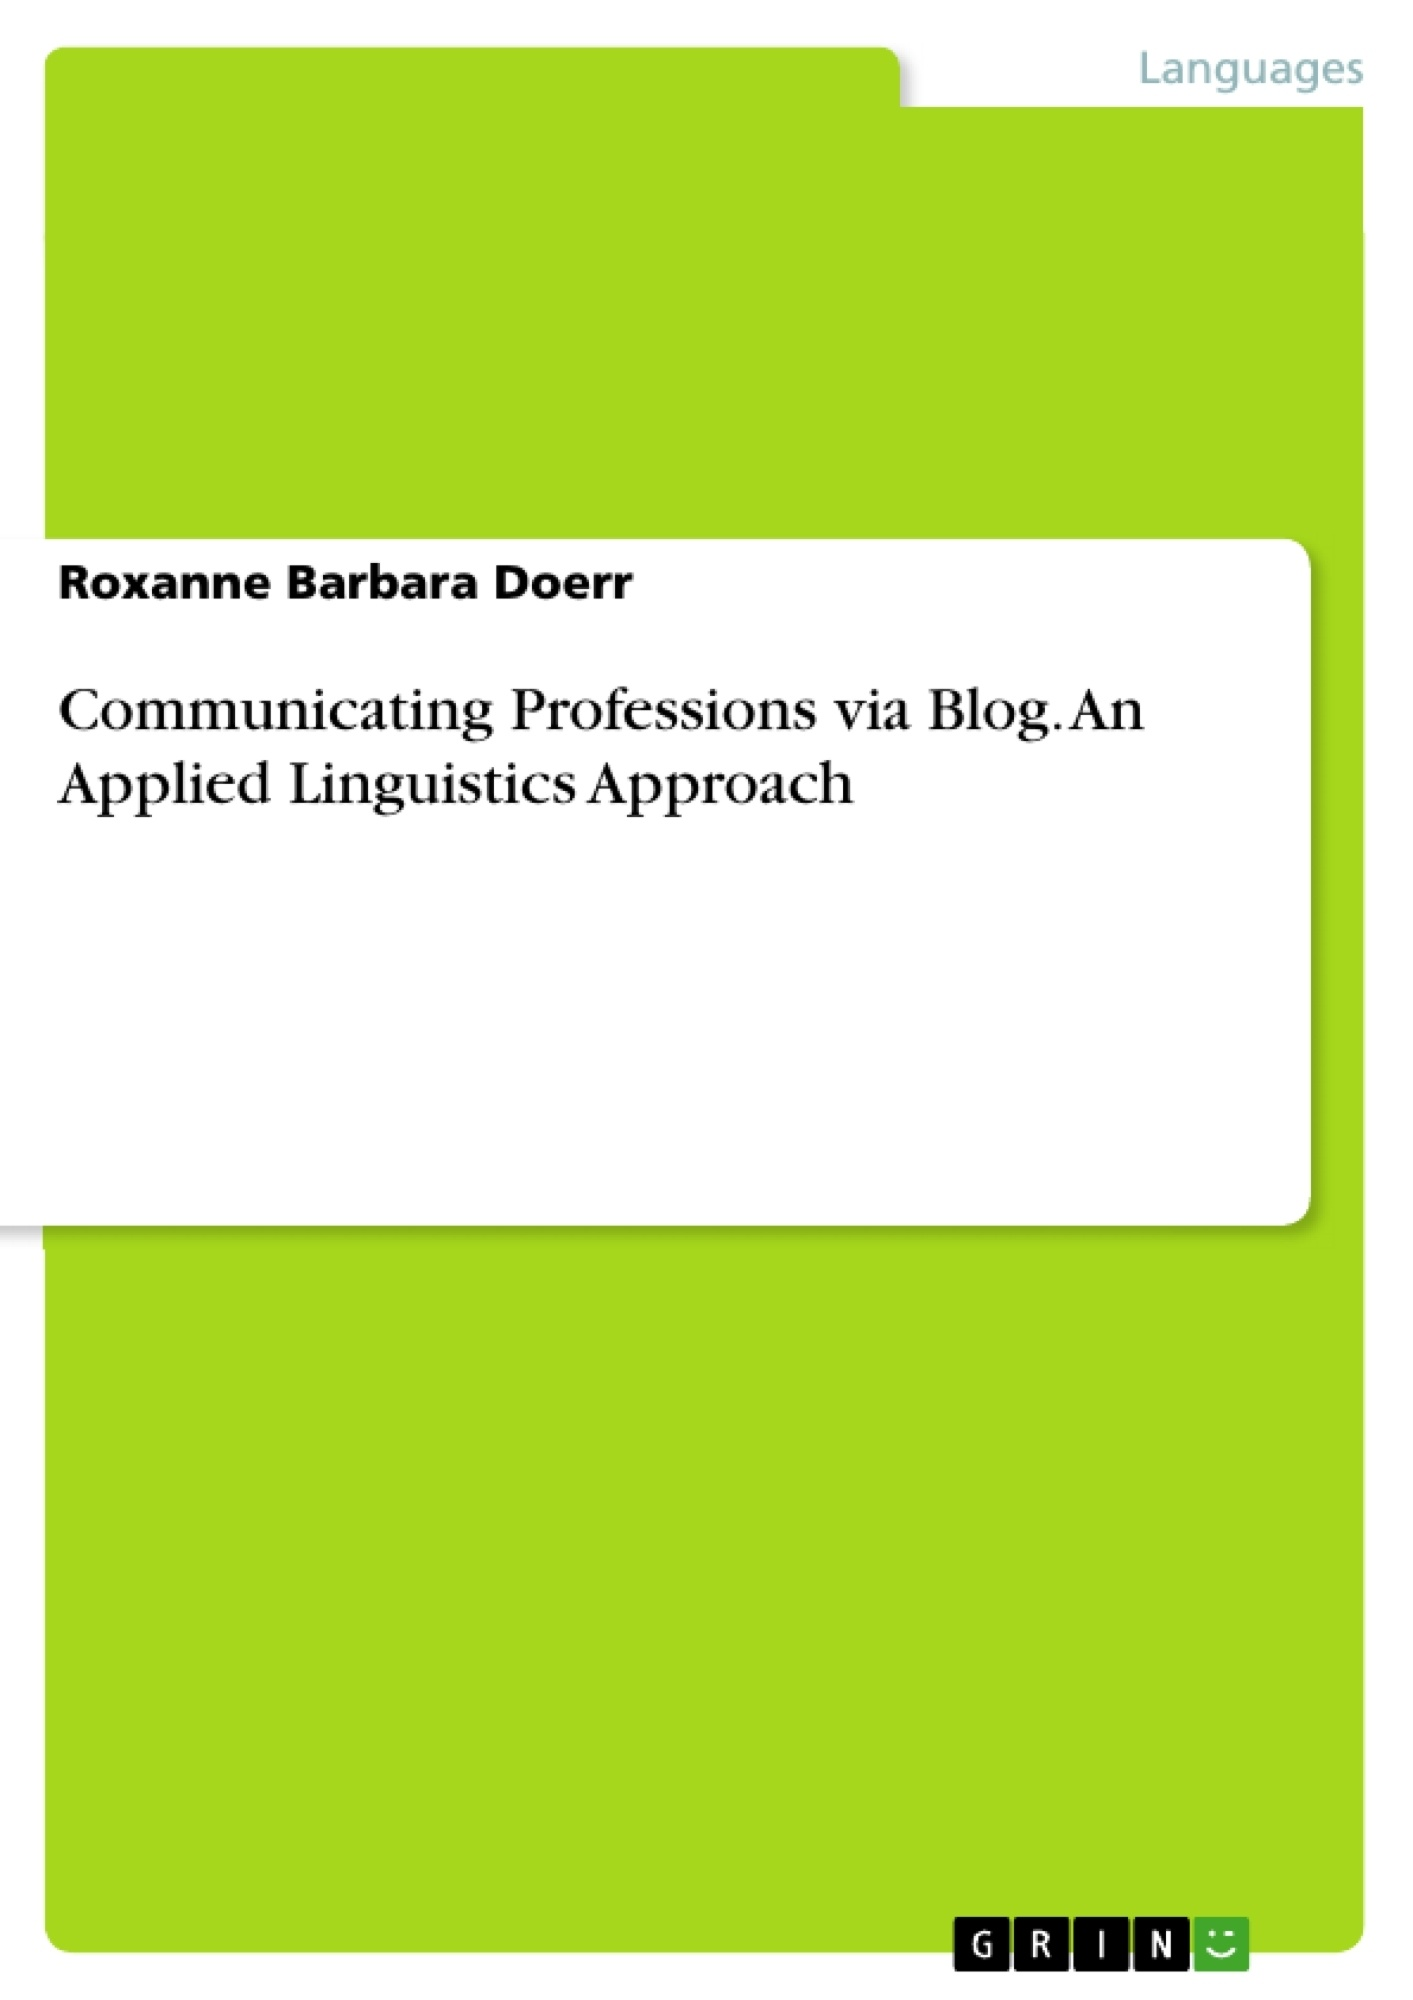 Title: Communicating Professions via Blog. An Applied Linguistics Approach